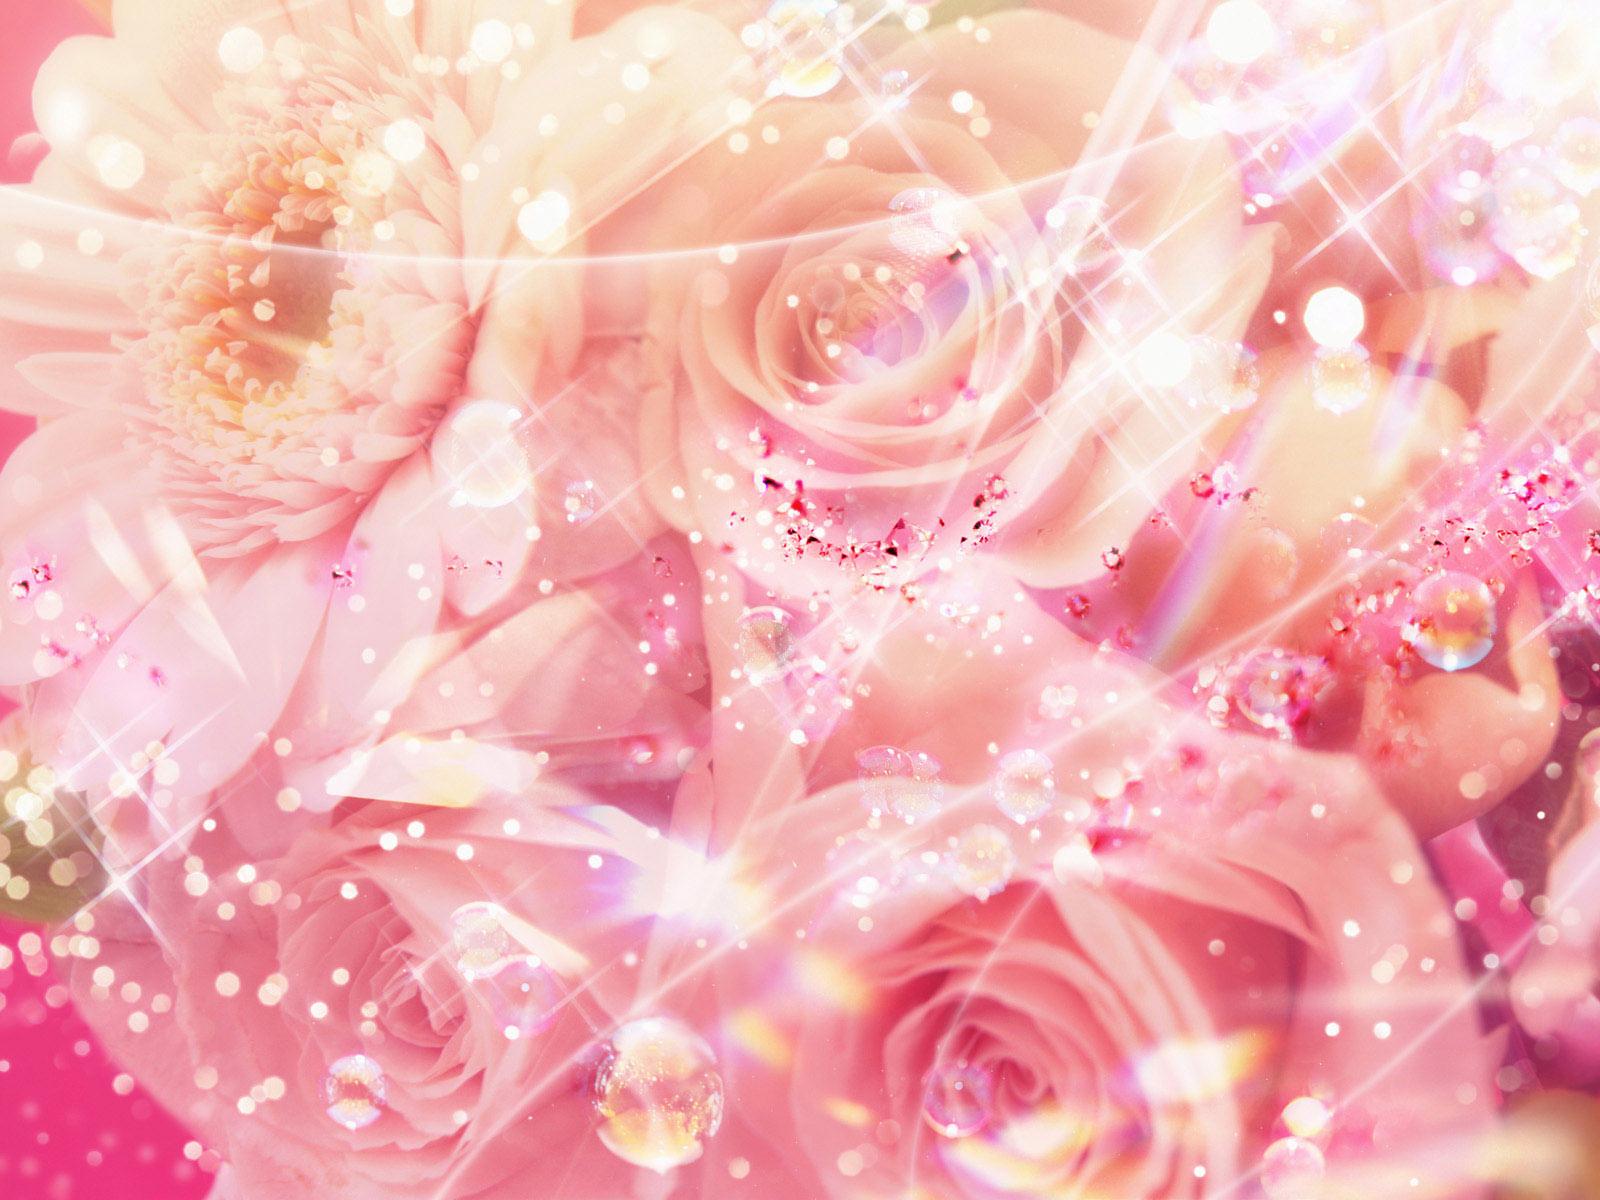 Pretty Pink Roses   Roses Wallpaper 34610926 1600x1200